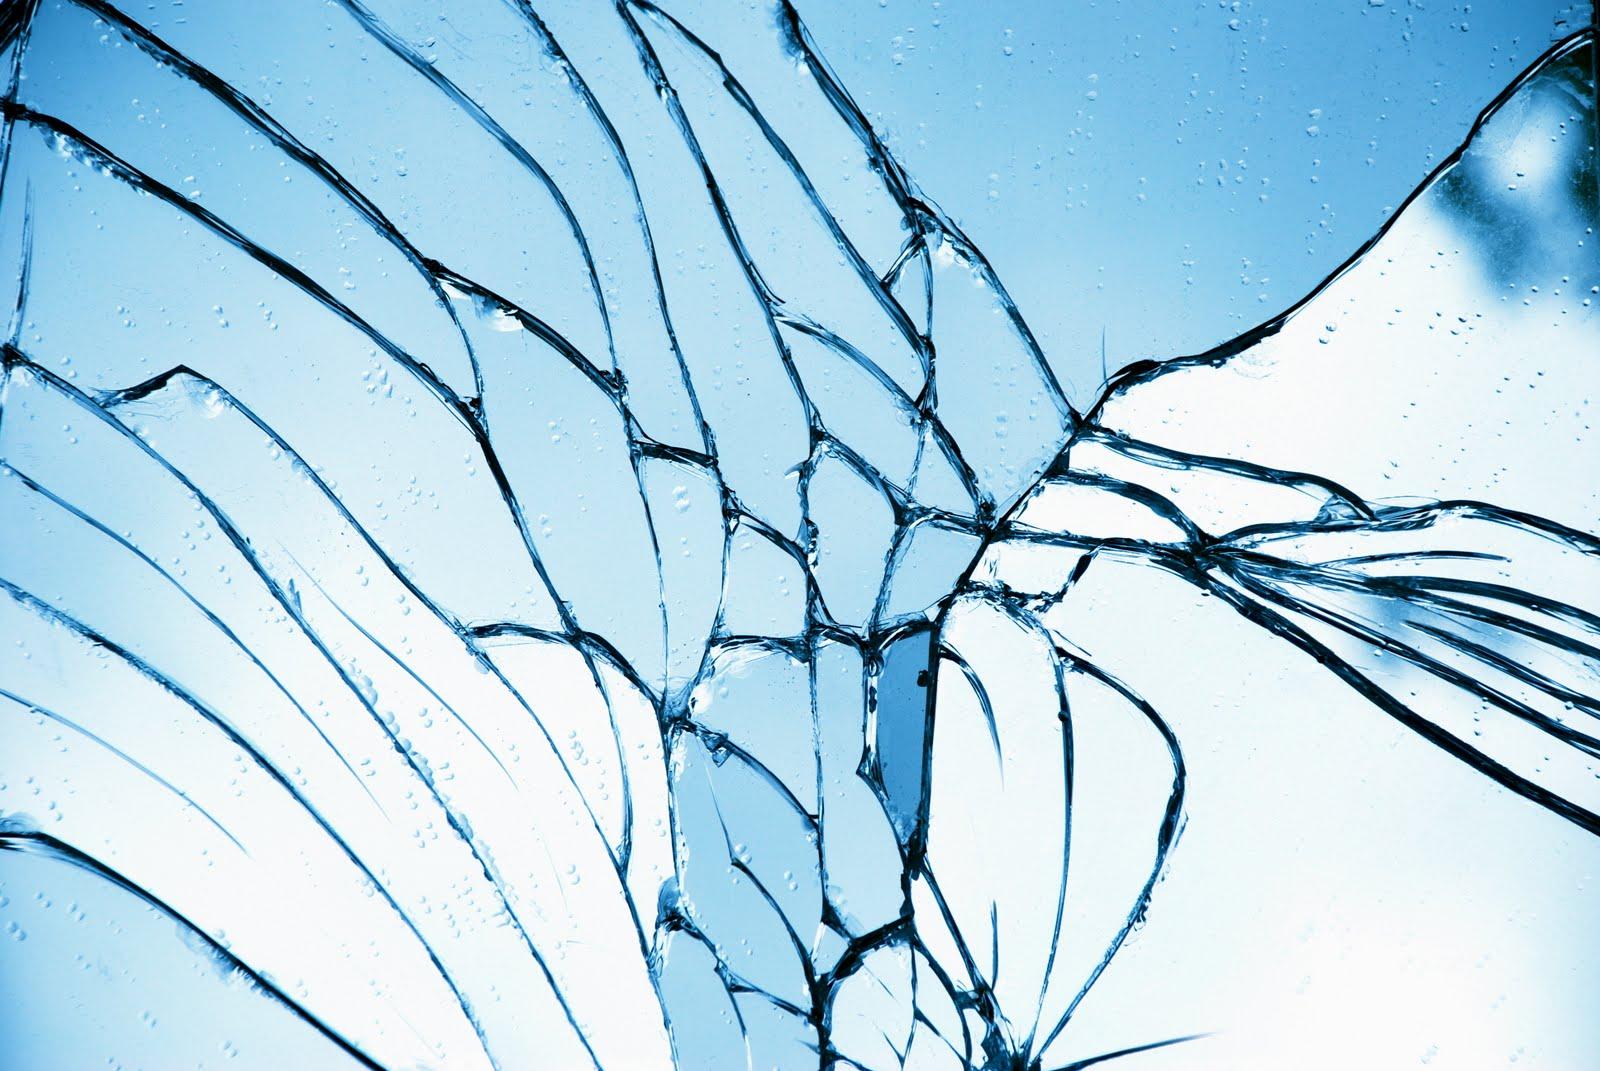 Broken Glass Wallpapers White , HD Wallpaper & Backgrounds